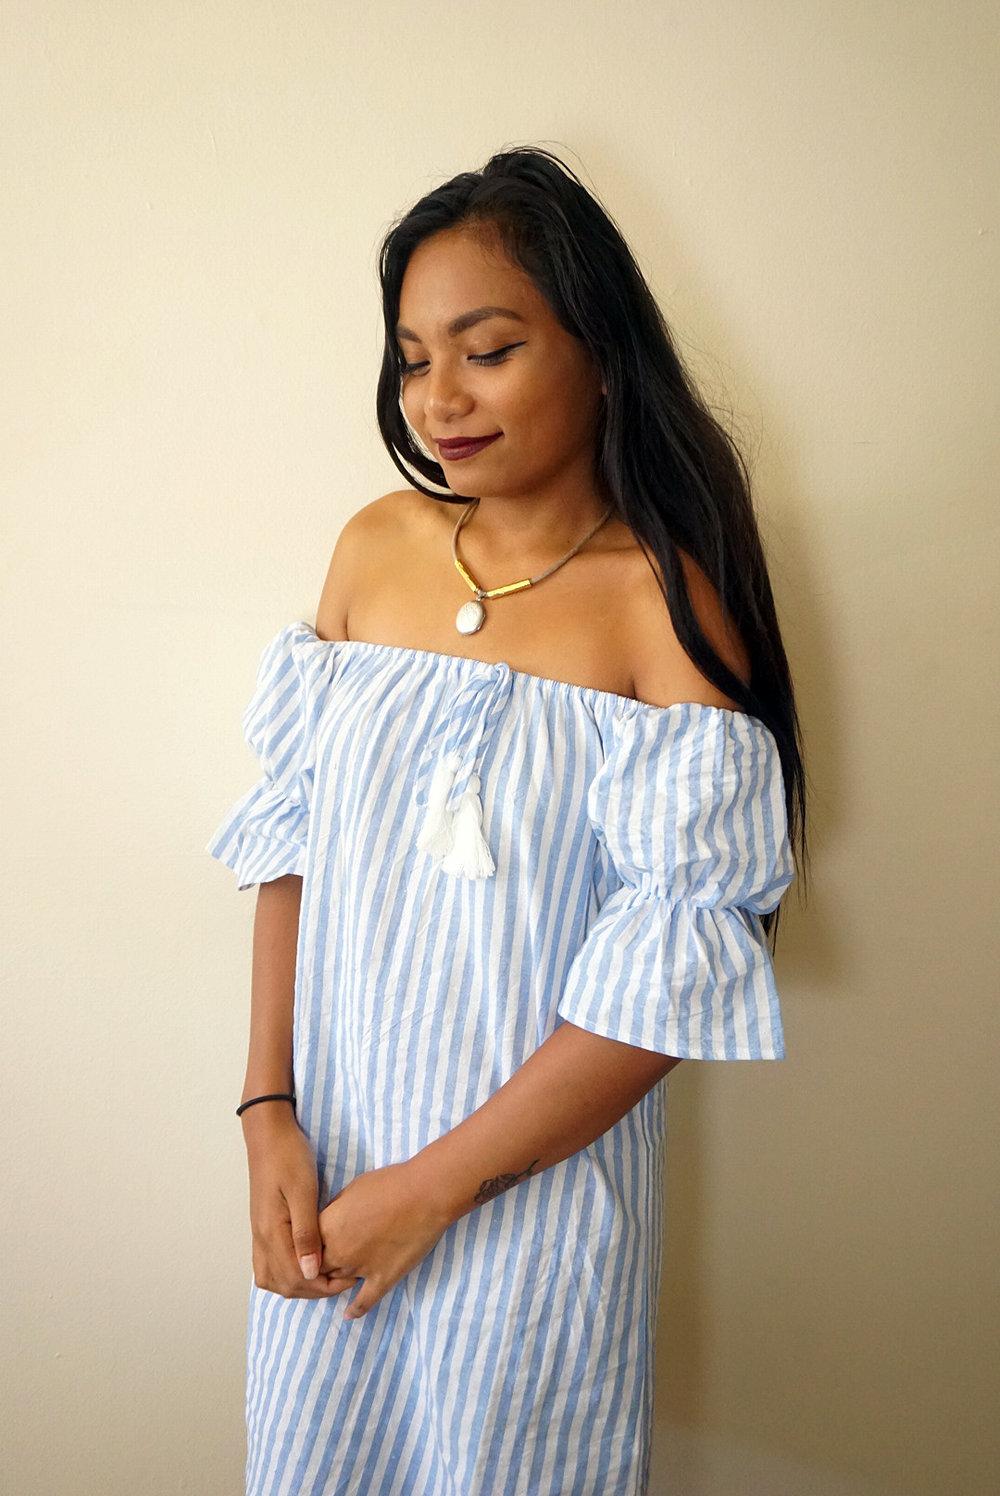 Off-the-shoulder-striped-dress-summer-fall-style-blogger-LINDATENCHITRAN-4-1616x1080.jpg